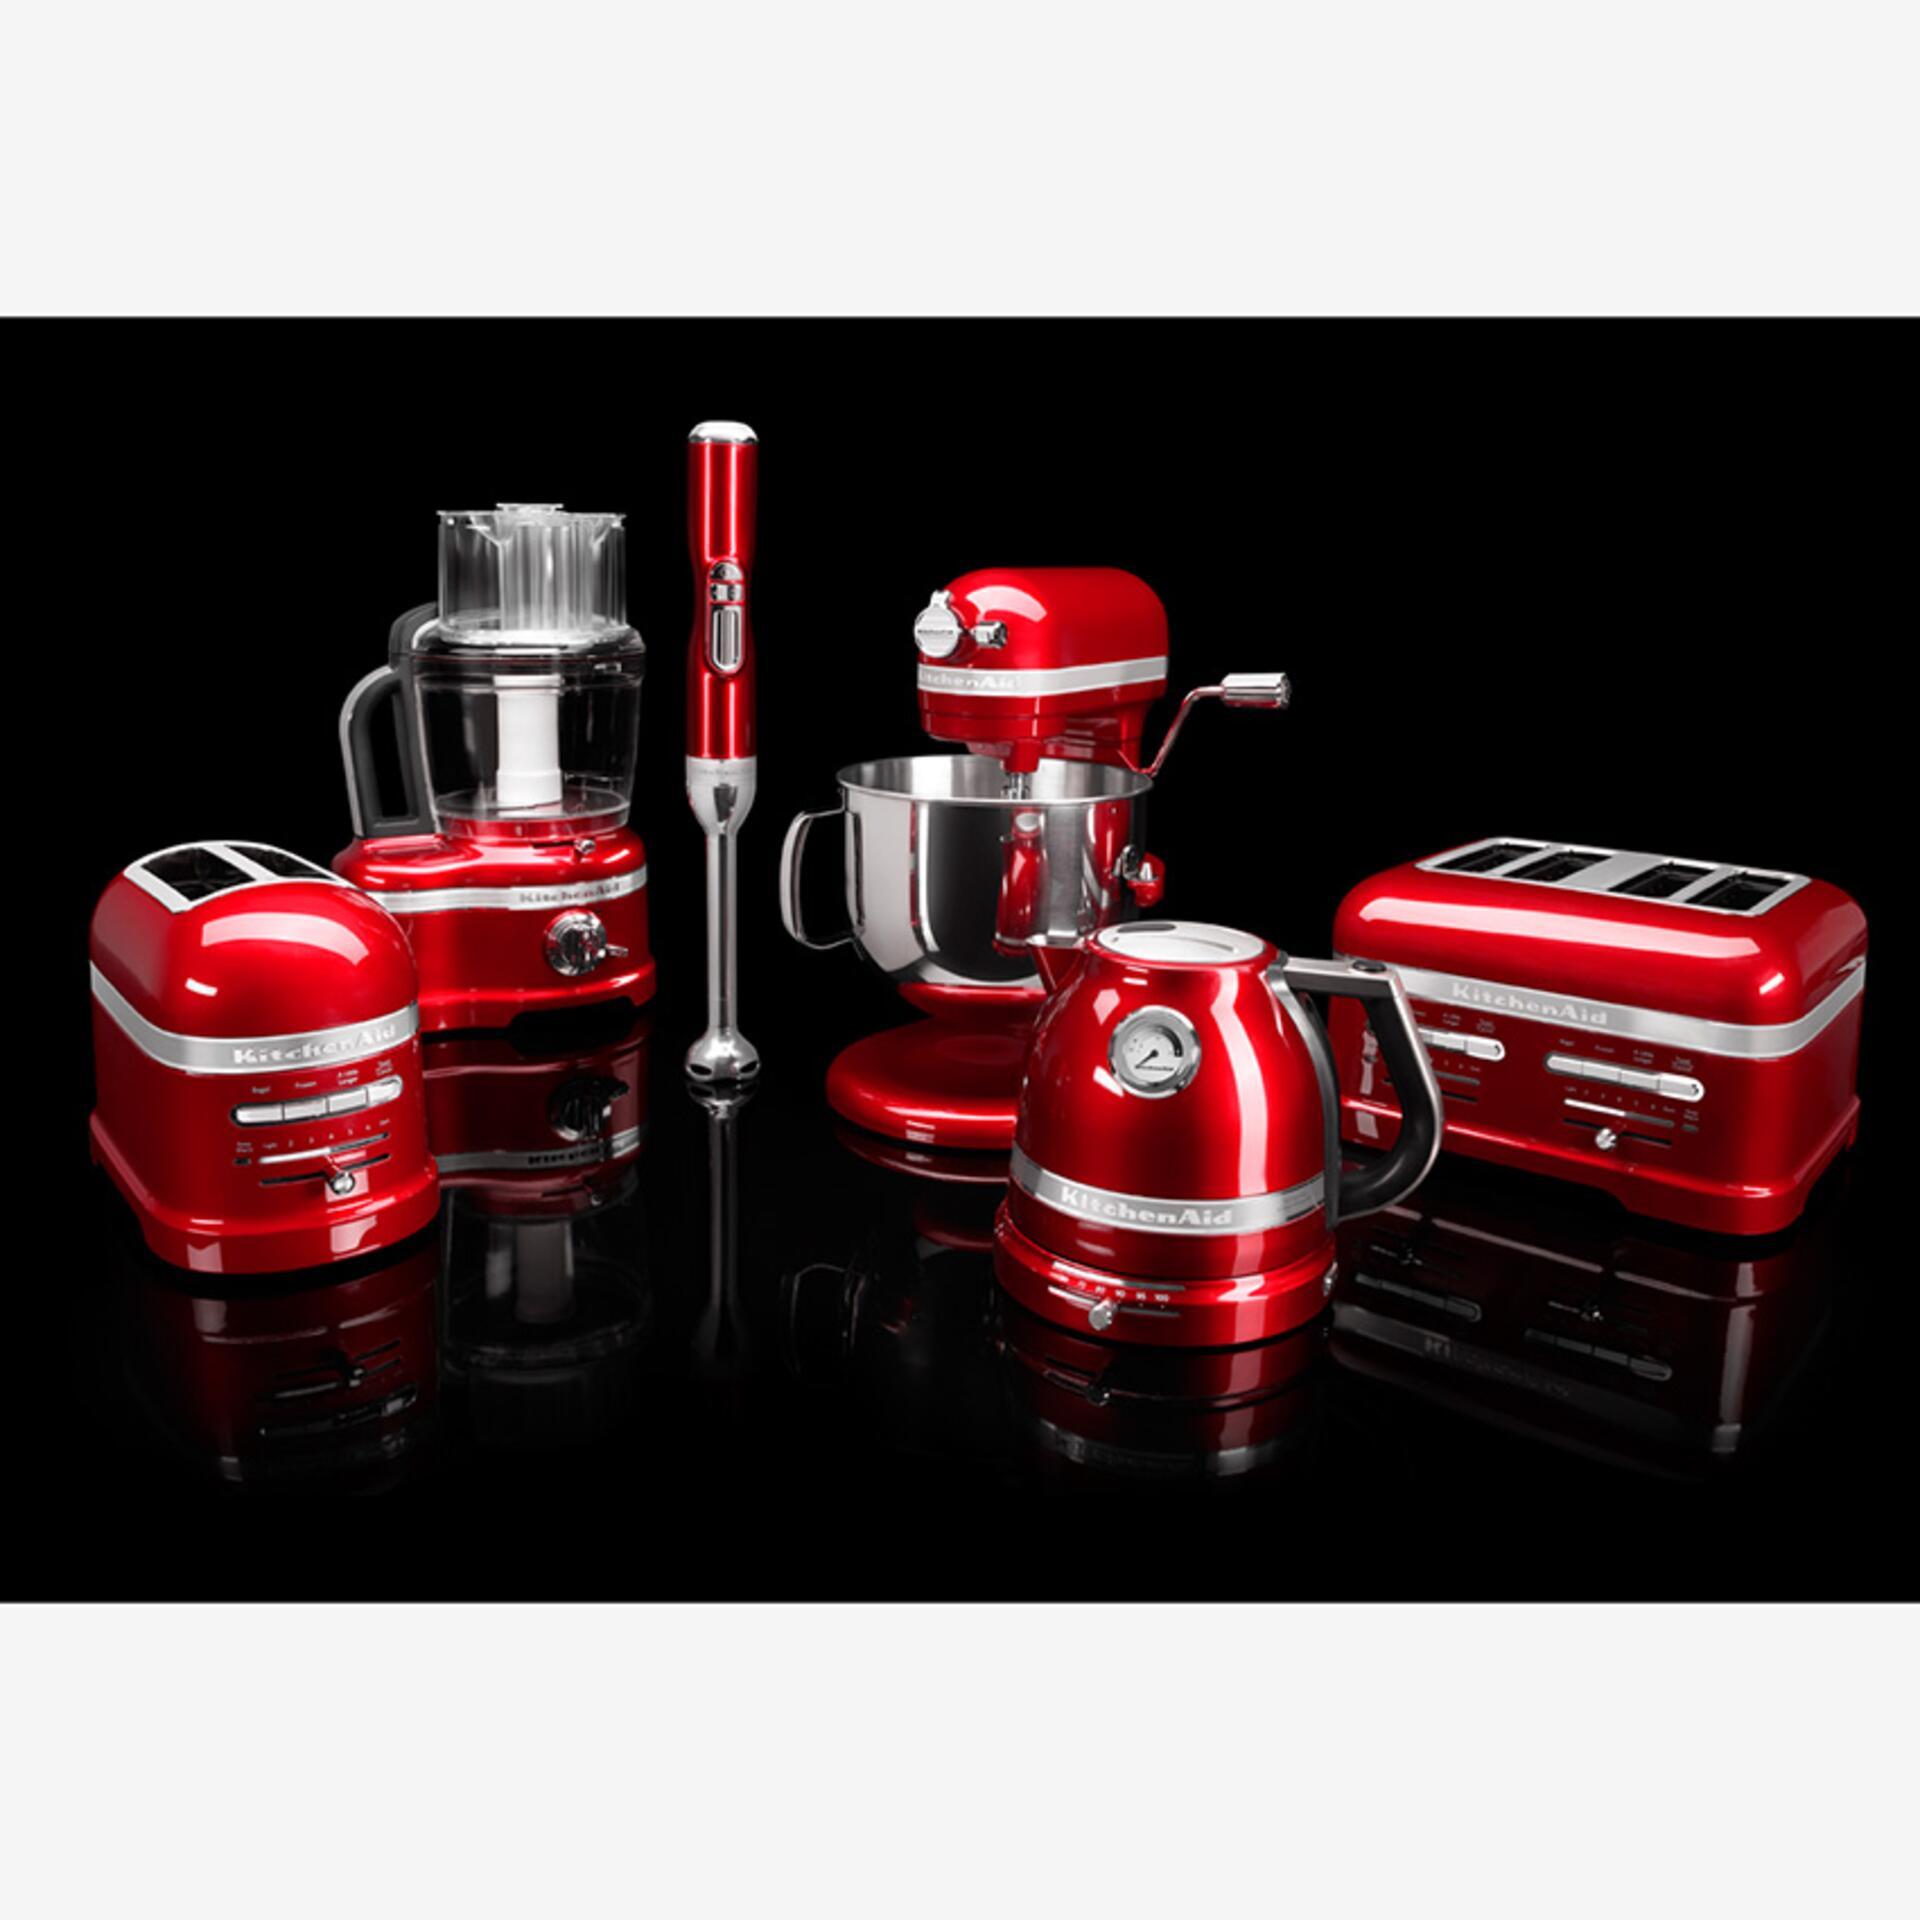 Kitchenaid Küchenmaschine Empire Rot 5KSM175PSEER